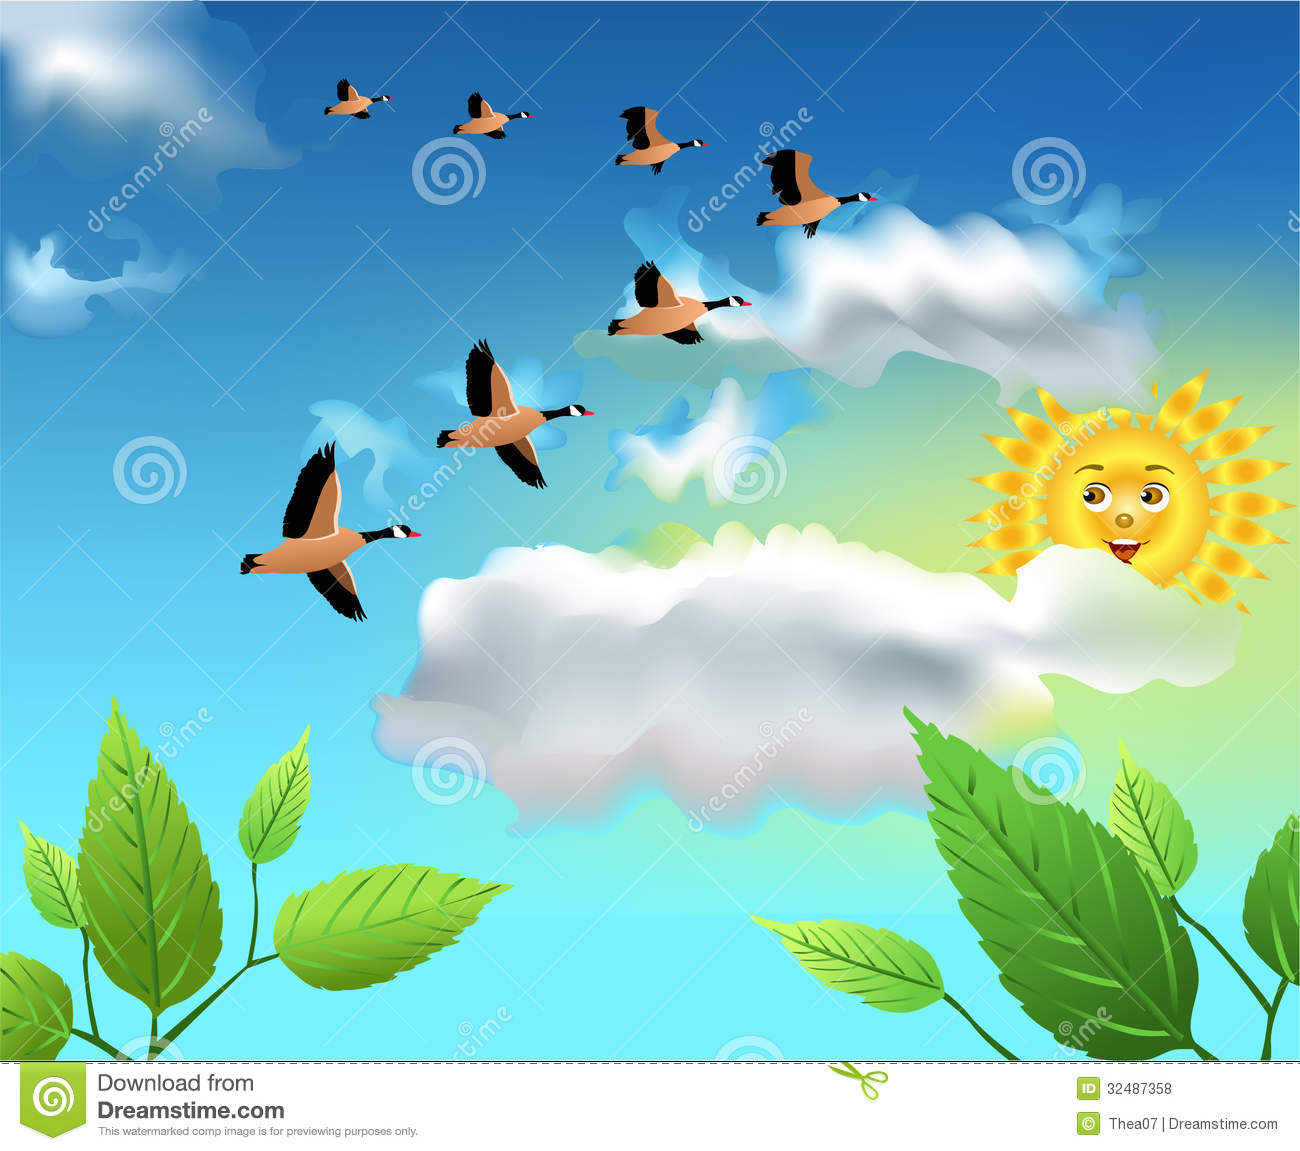 Birds in the sky clipart.